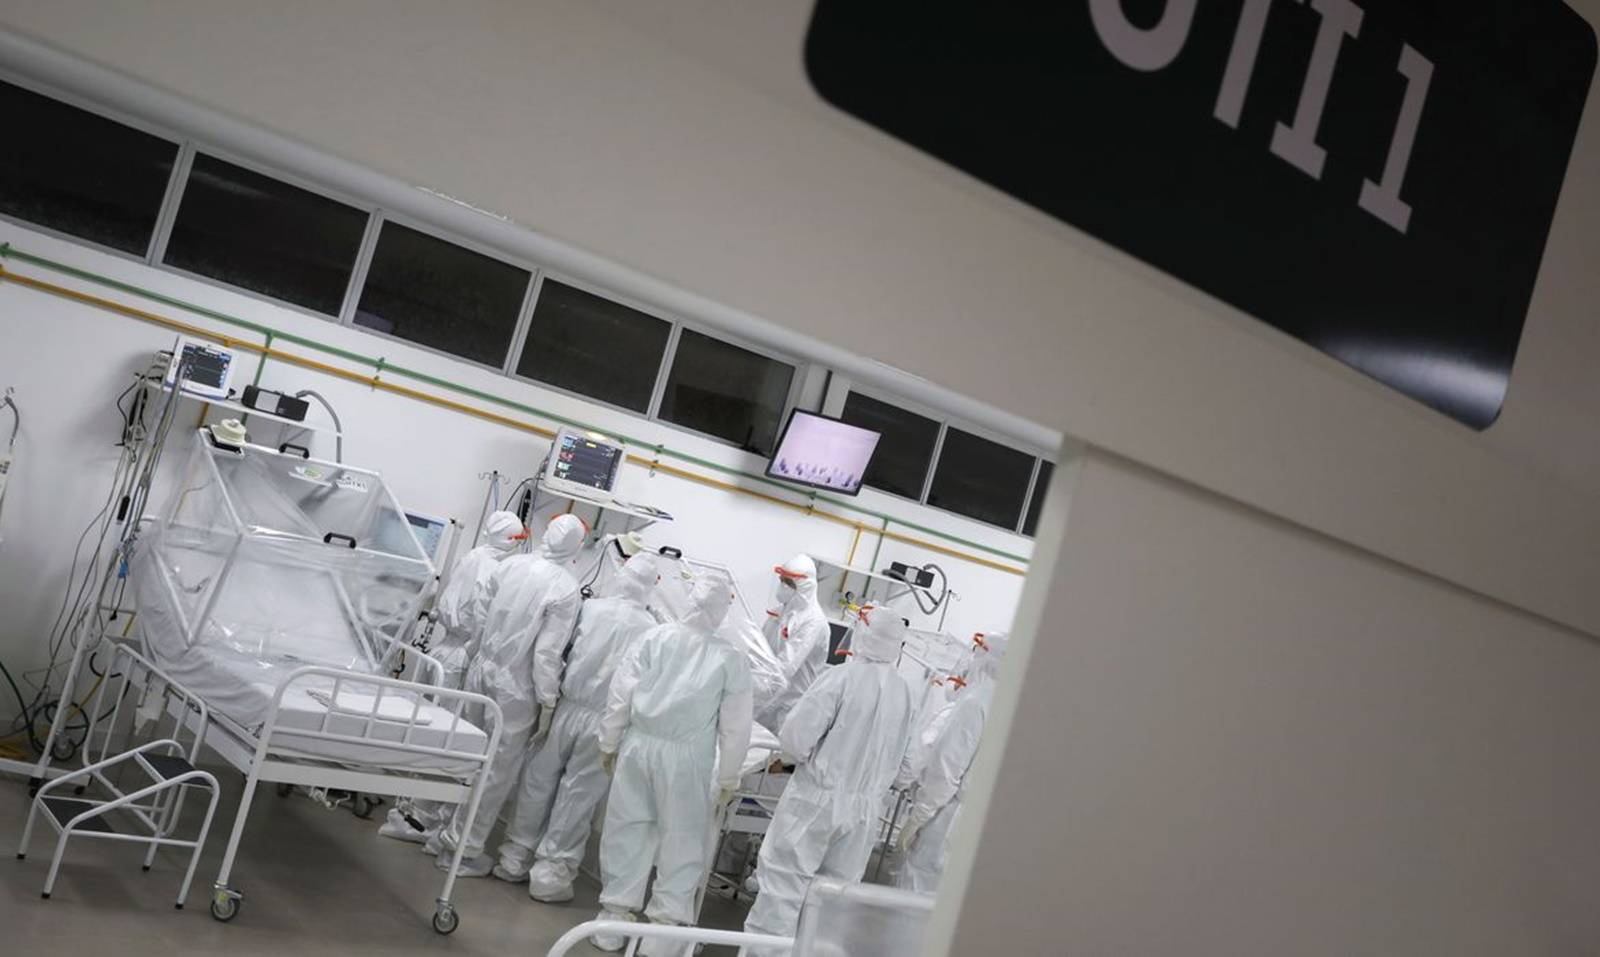 Crivella alerta para semana decisiva contra o coronavírus no Rio